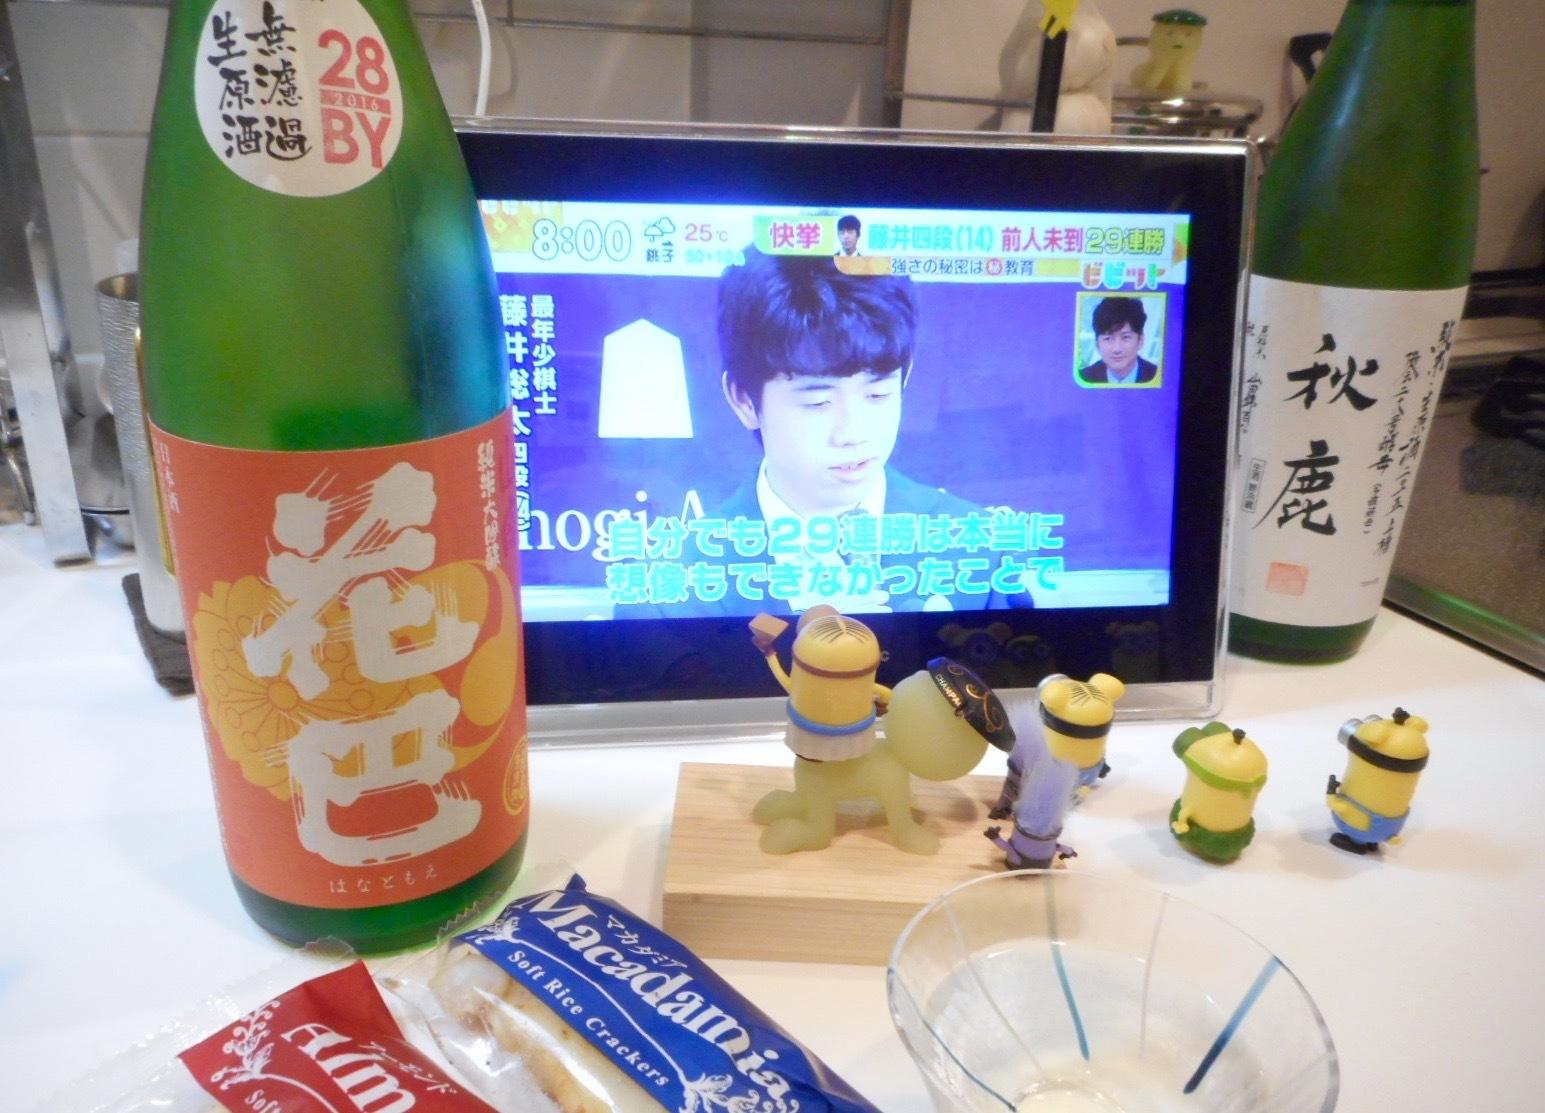 hanatomoe_yamahai_jundai28by11.jpg